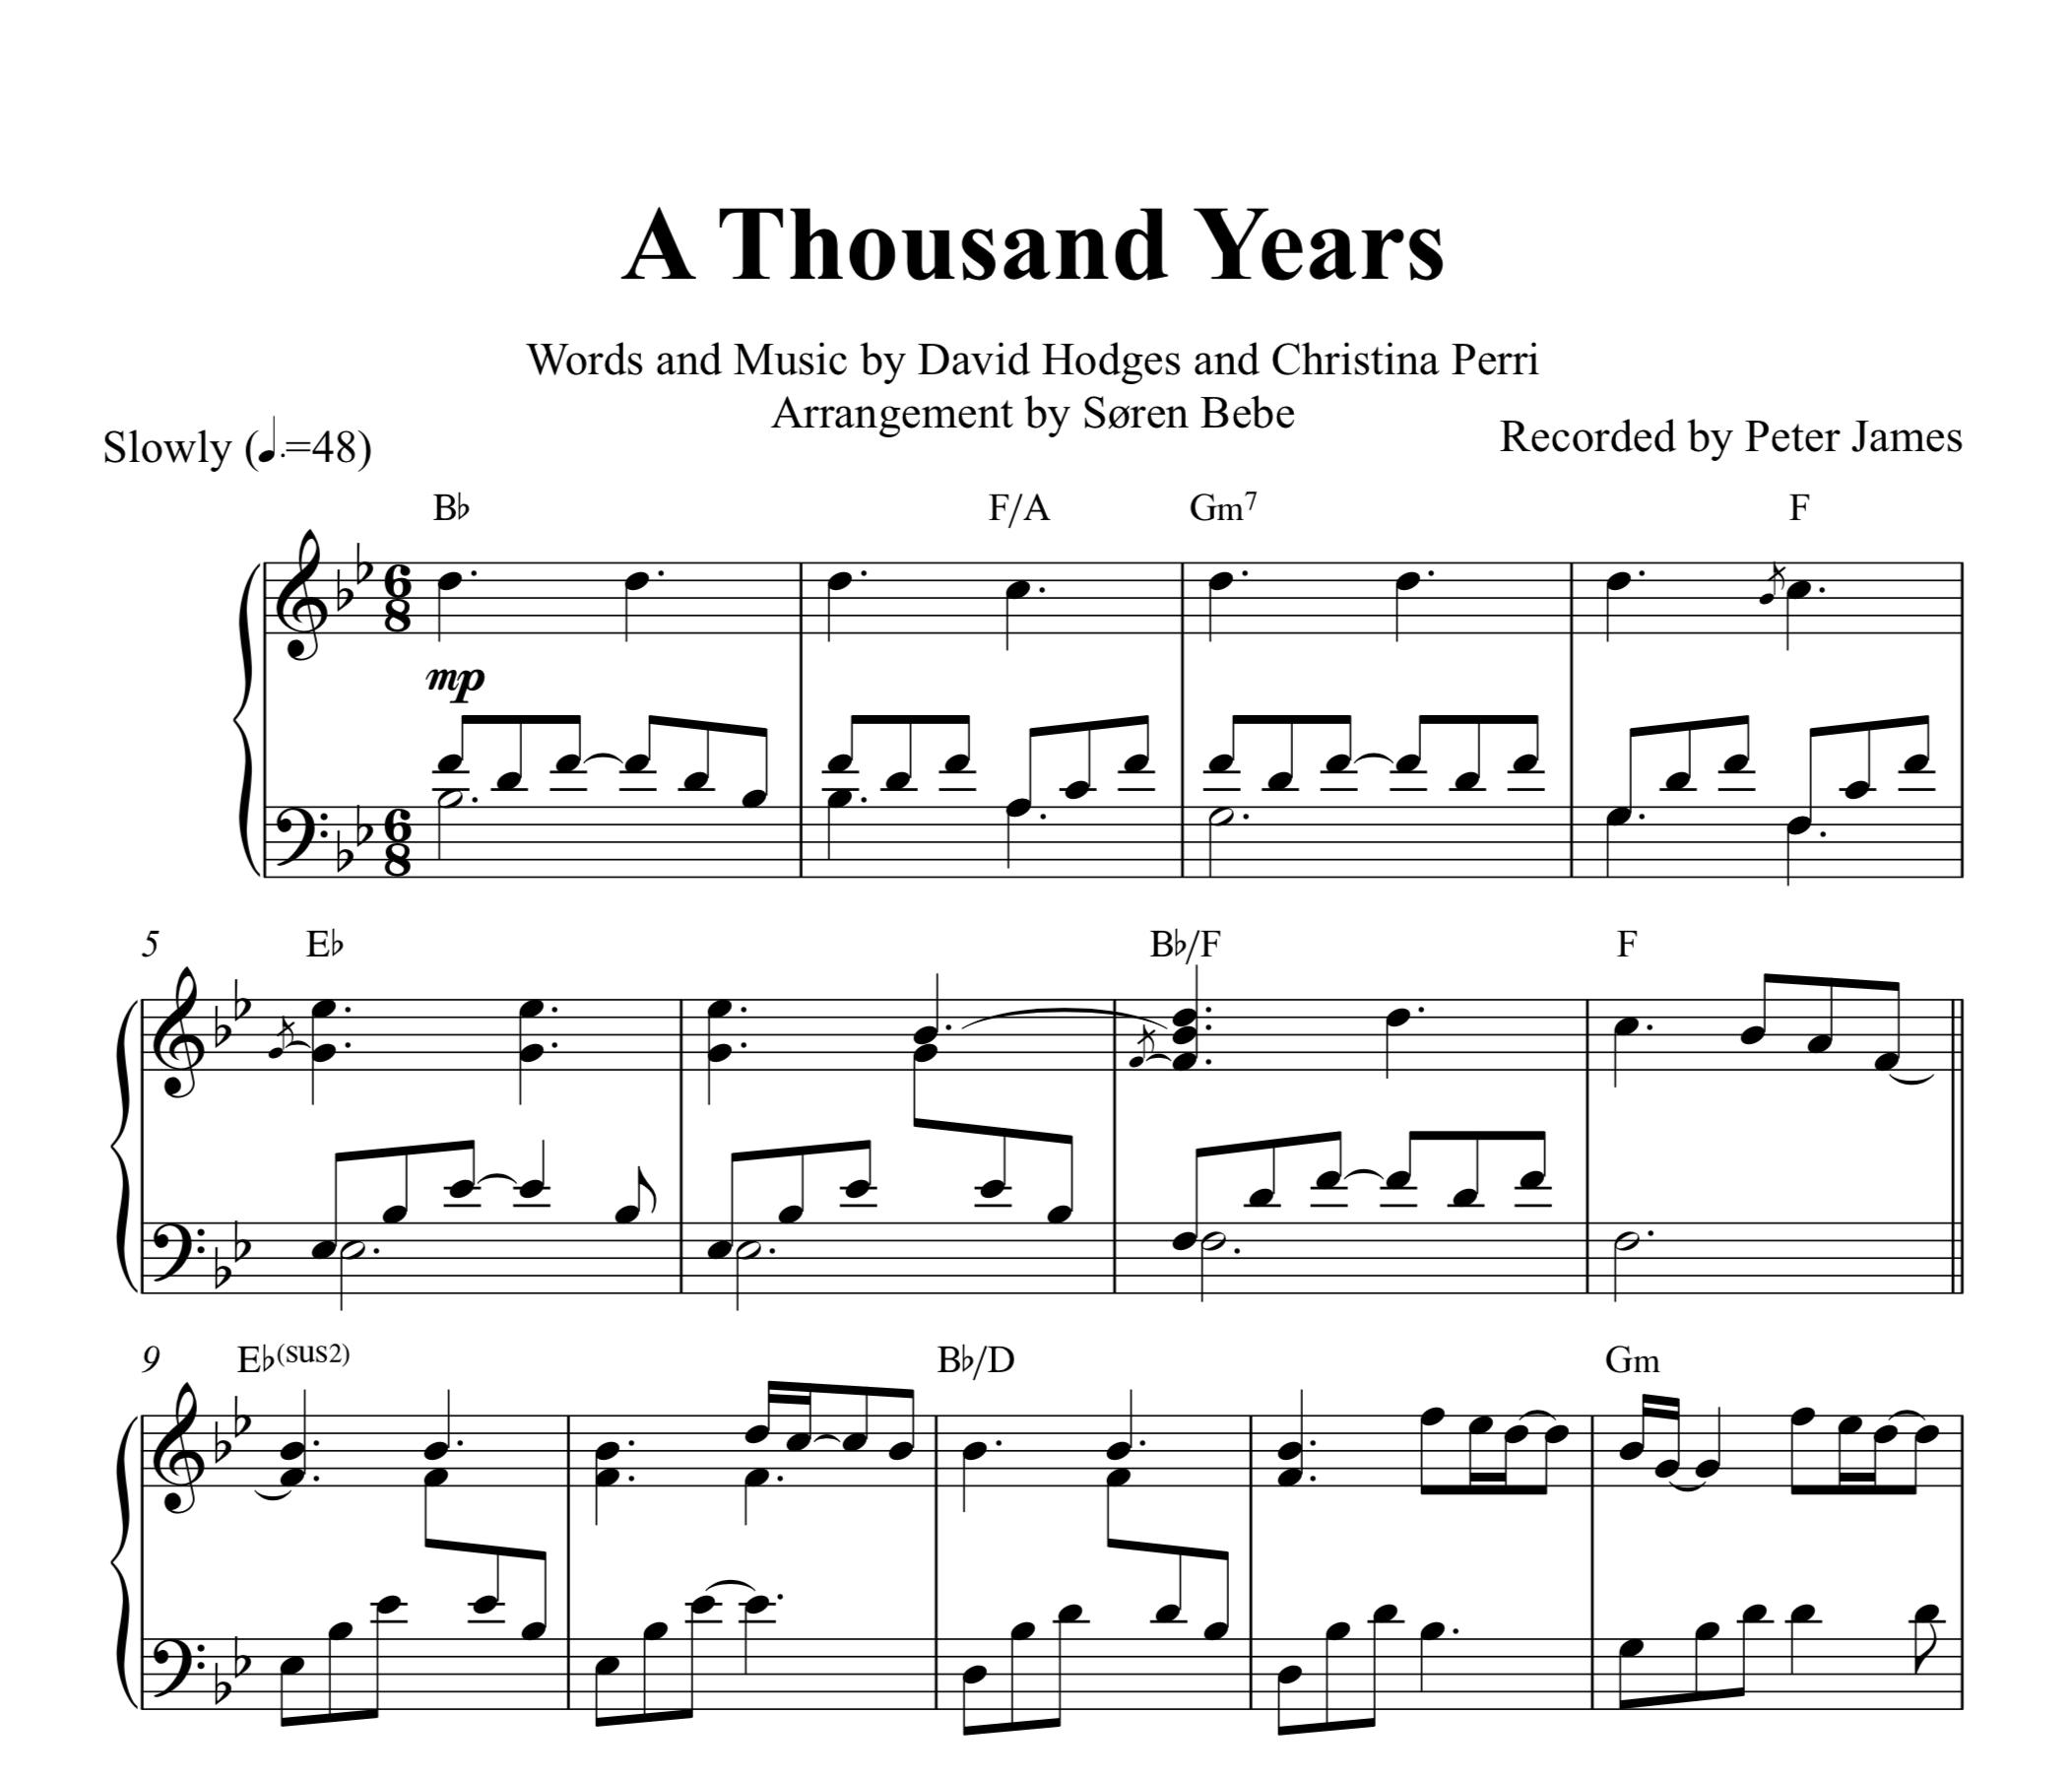 Beginner 7 Years Sheet Music Easy 42 A Thousand Years